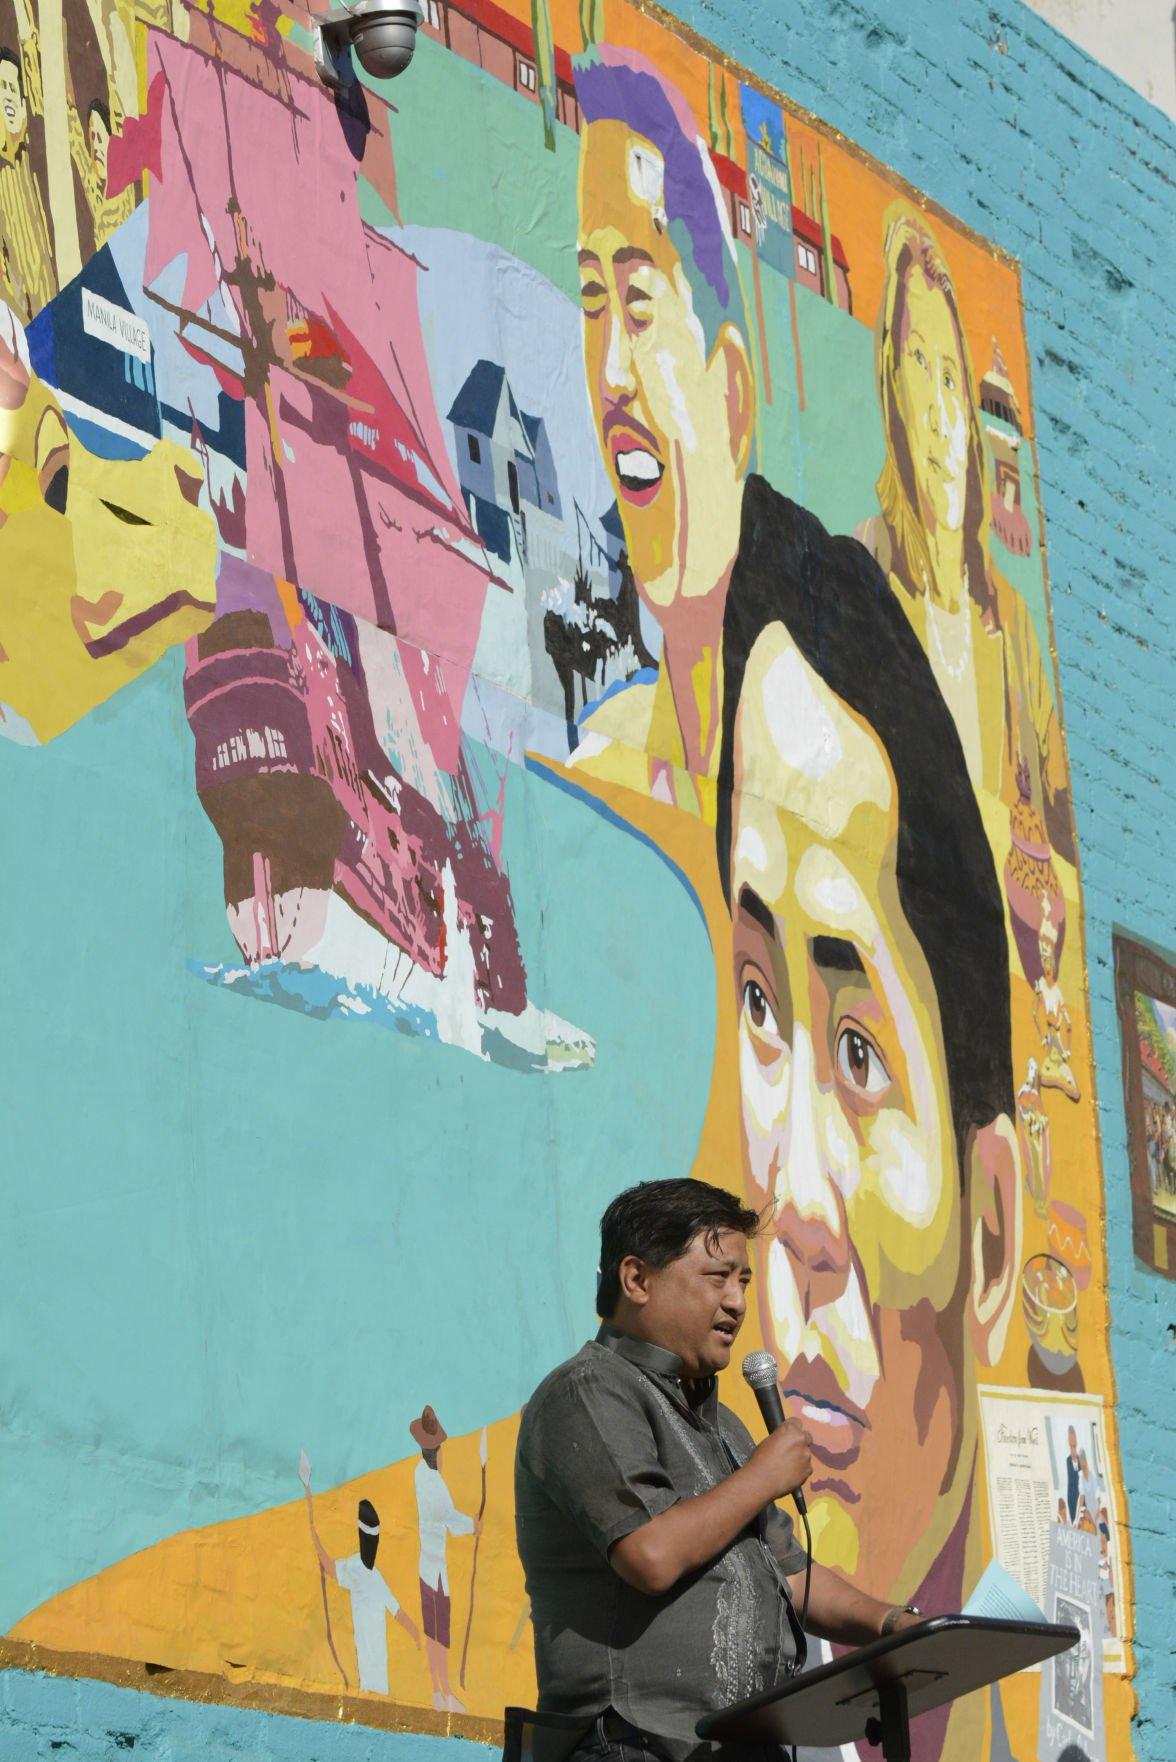 021618 Filipino-American mural 02.jpg